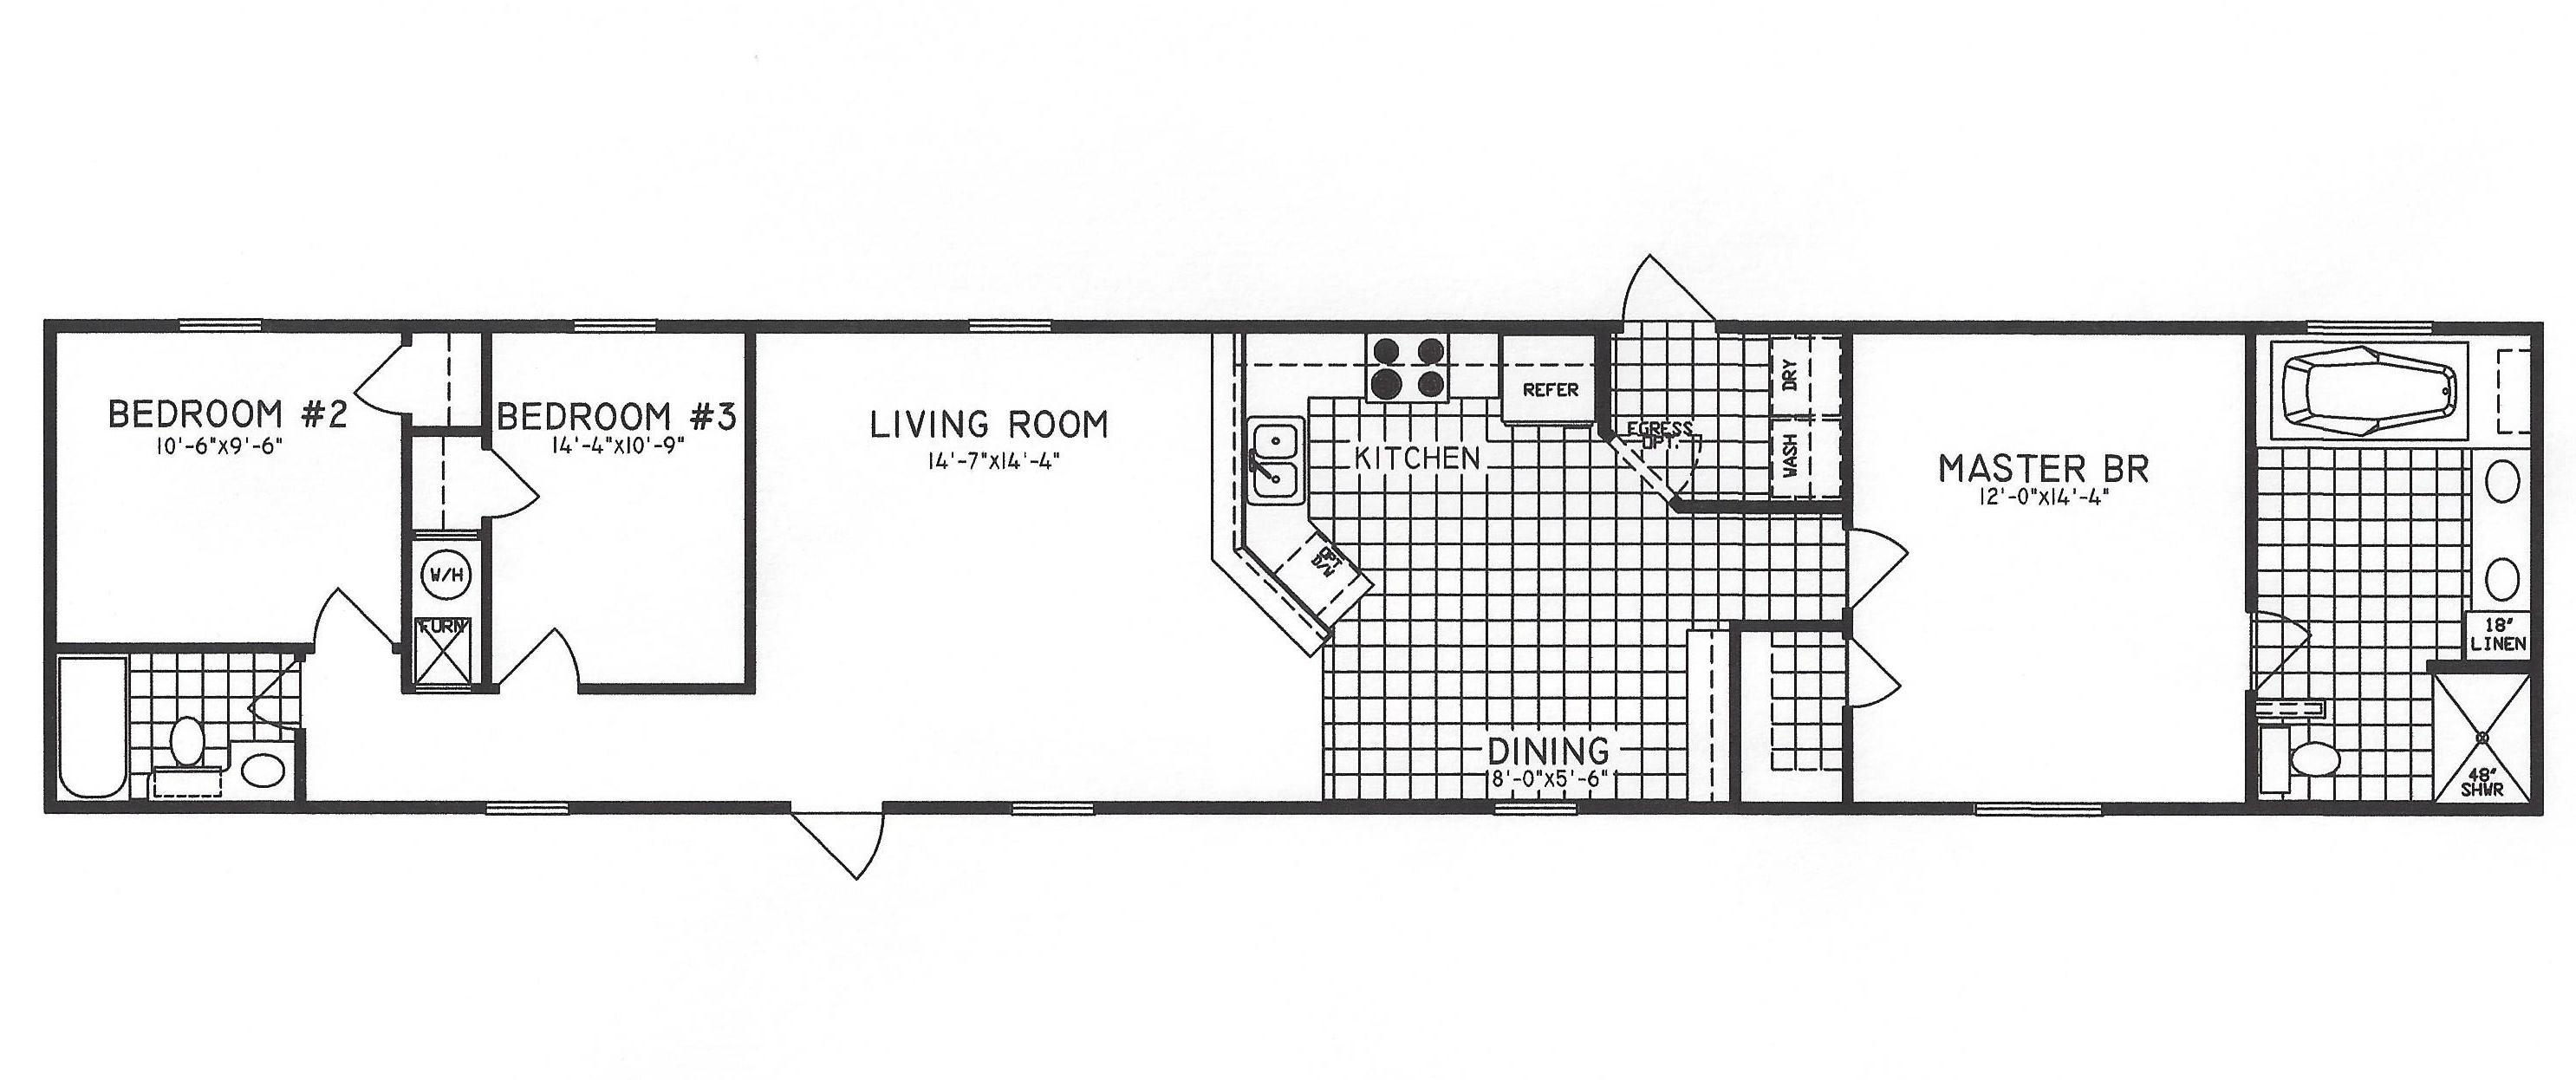 3 bedroom floor plan c 1302 hawks homes manufactured for Arkansas house plans